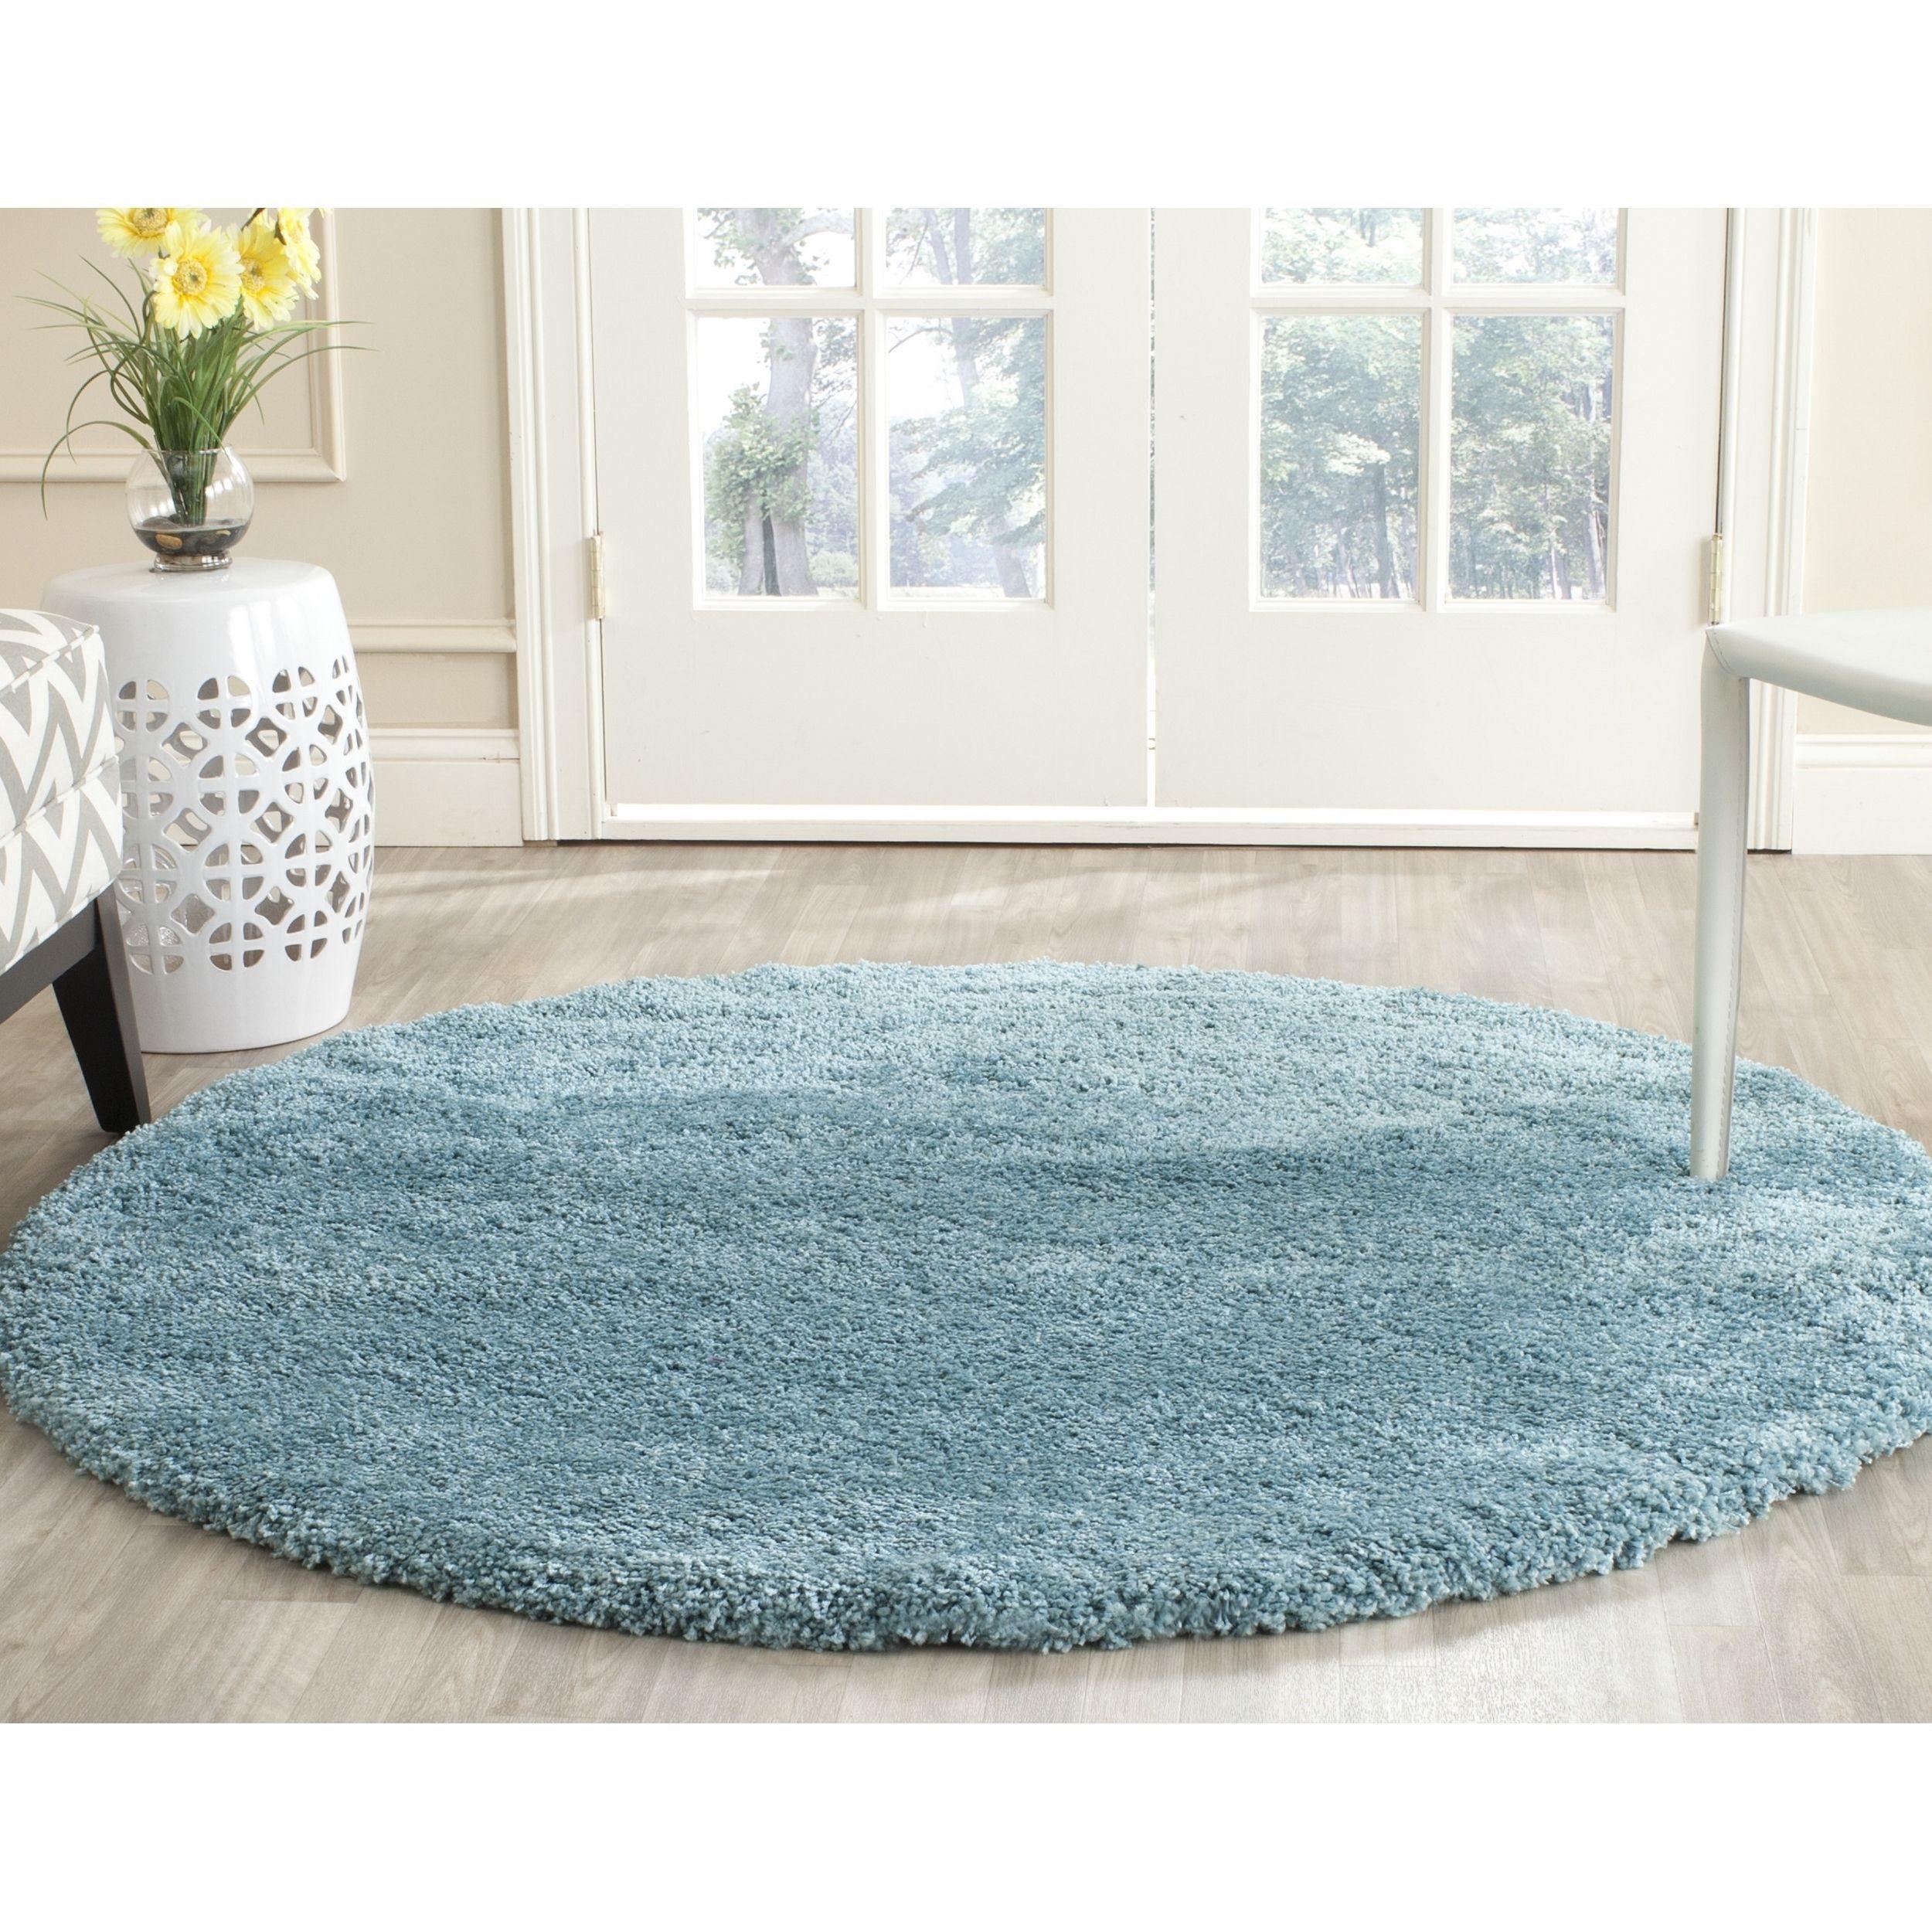 Safavieh Milan Shag Aqua Blue Rug (10' Round) (SG180-6060-10R), Size 10' (Polypropylene, Solid)